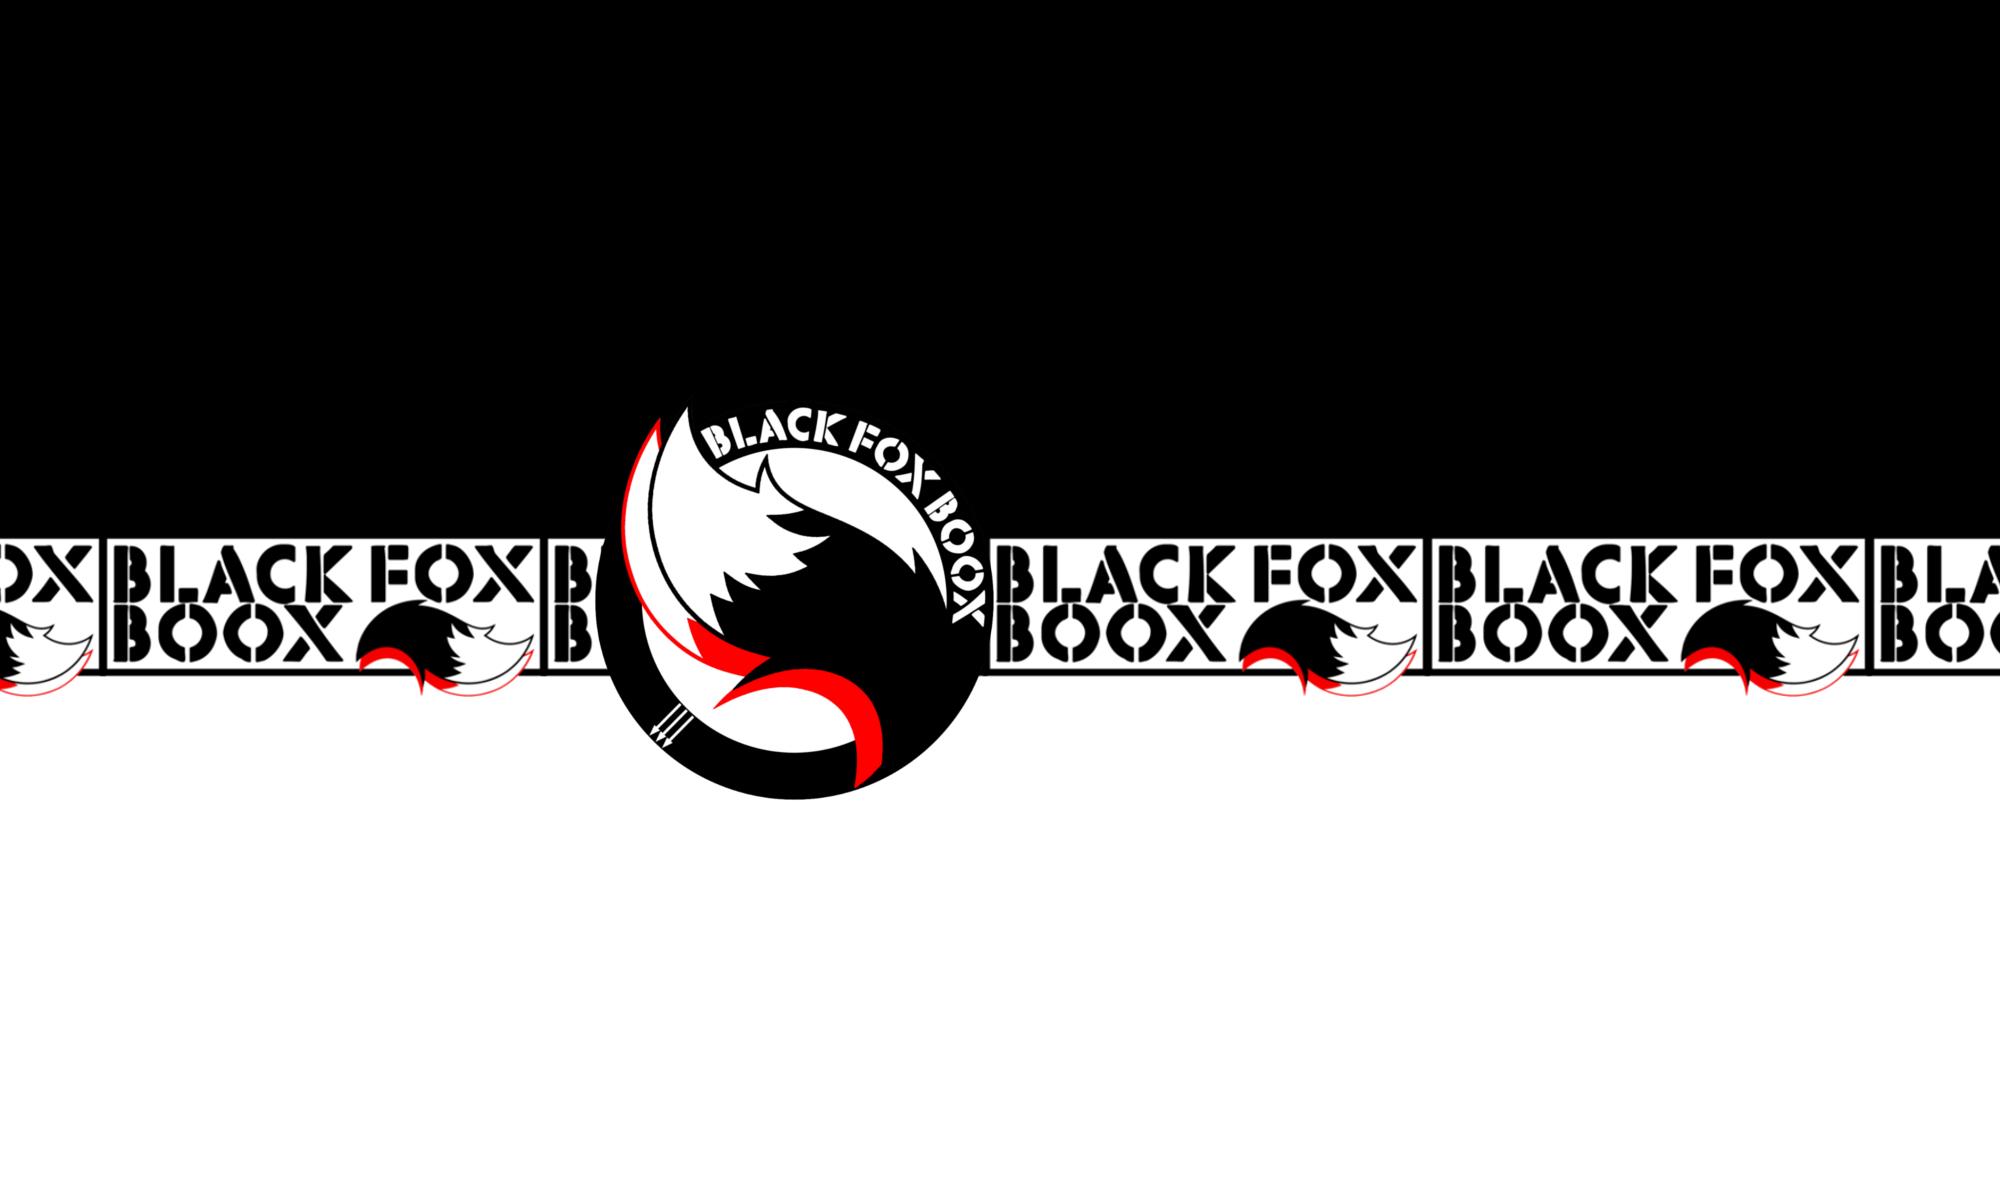 Black Fox Boox